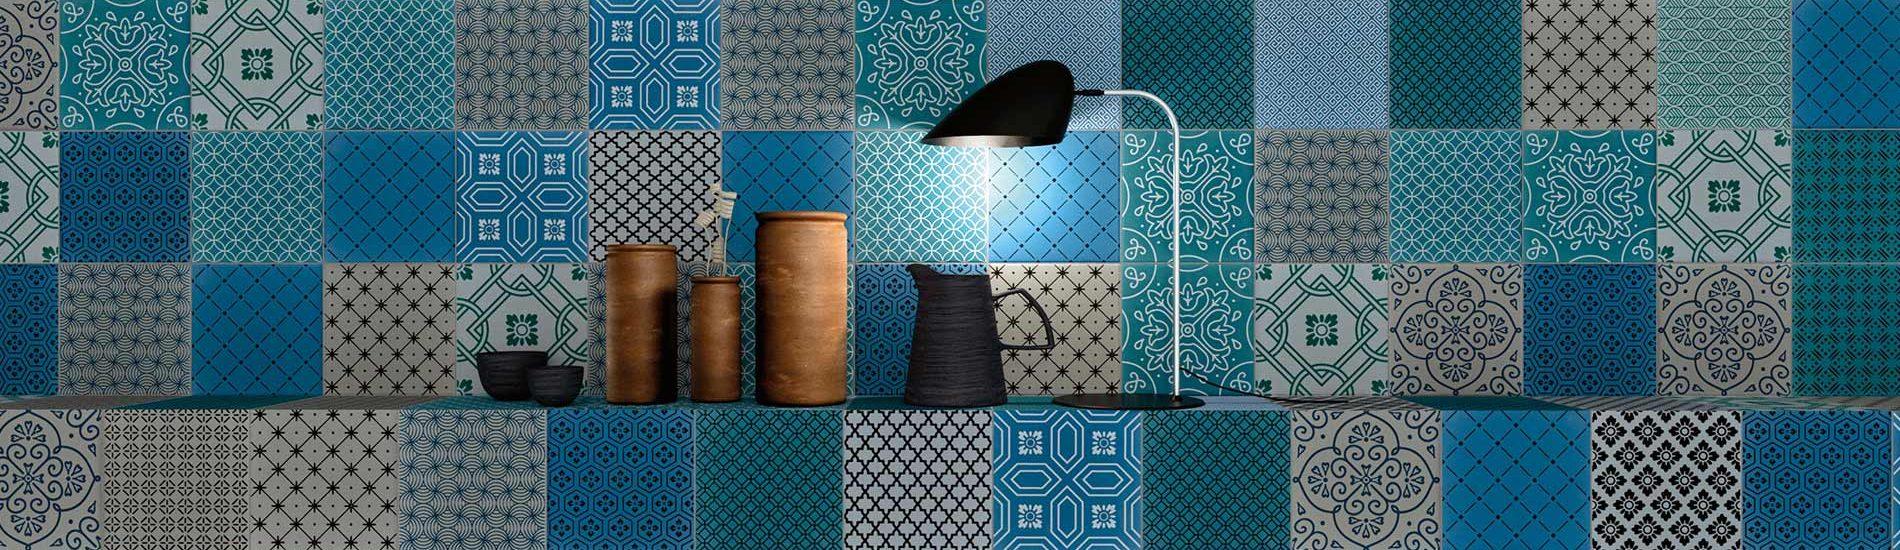 banner-terra-mia-italian-decorative-pattern-floor-wall-tile-Ornamenta-Gamma-Due-anaheim